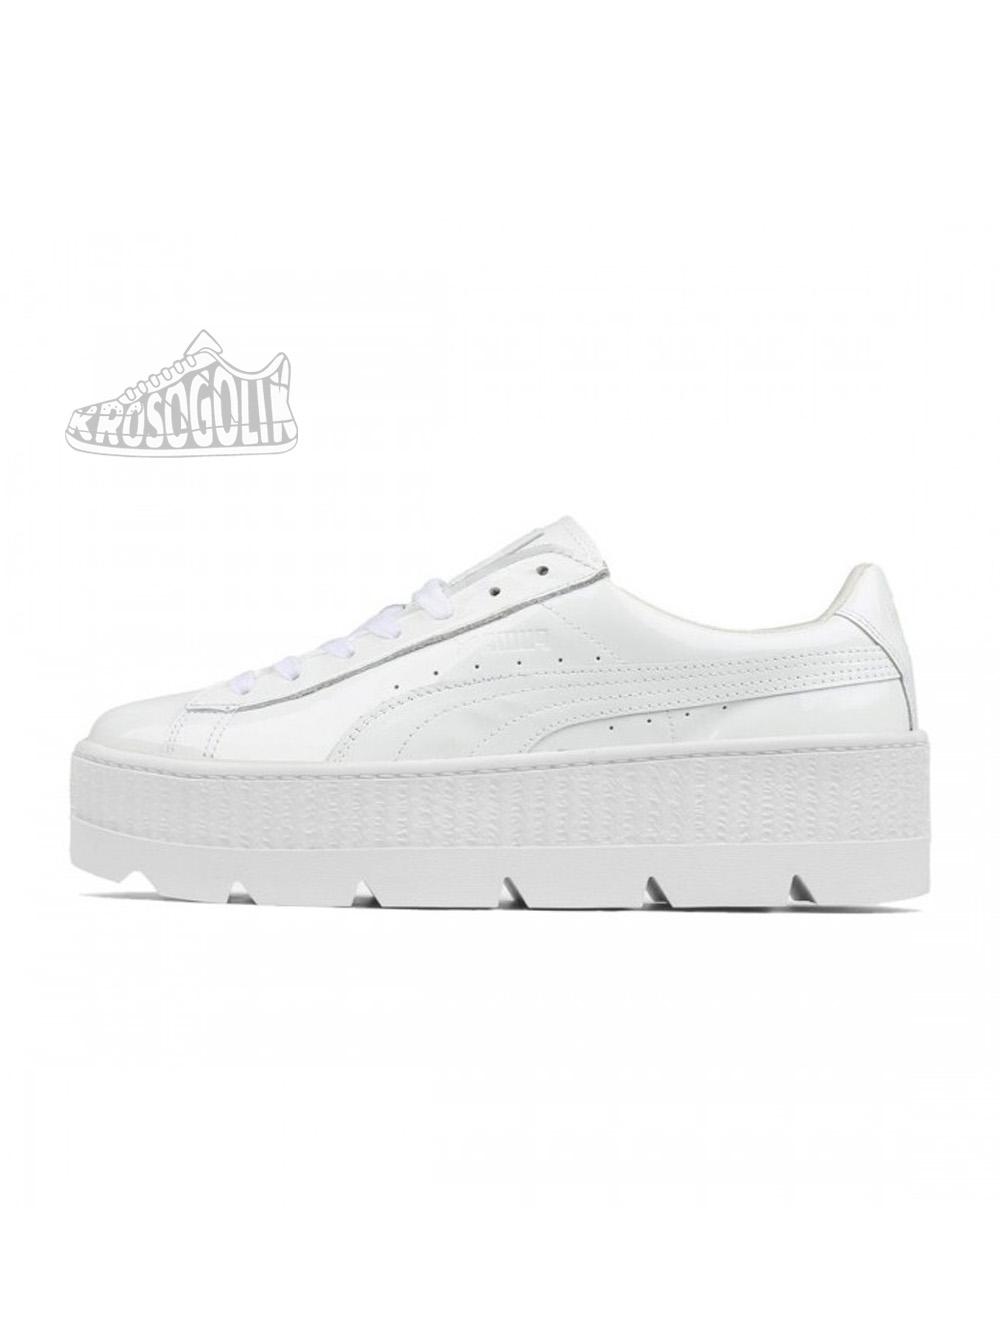 Купить женские кроссовки Rihanna x Puma Fenty Cleated Creeper на ... 9f51ec73a4e79